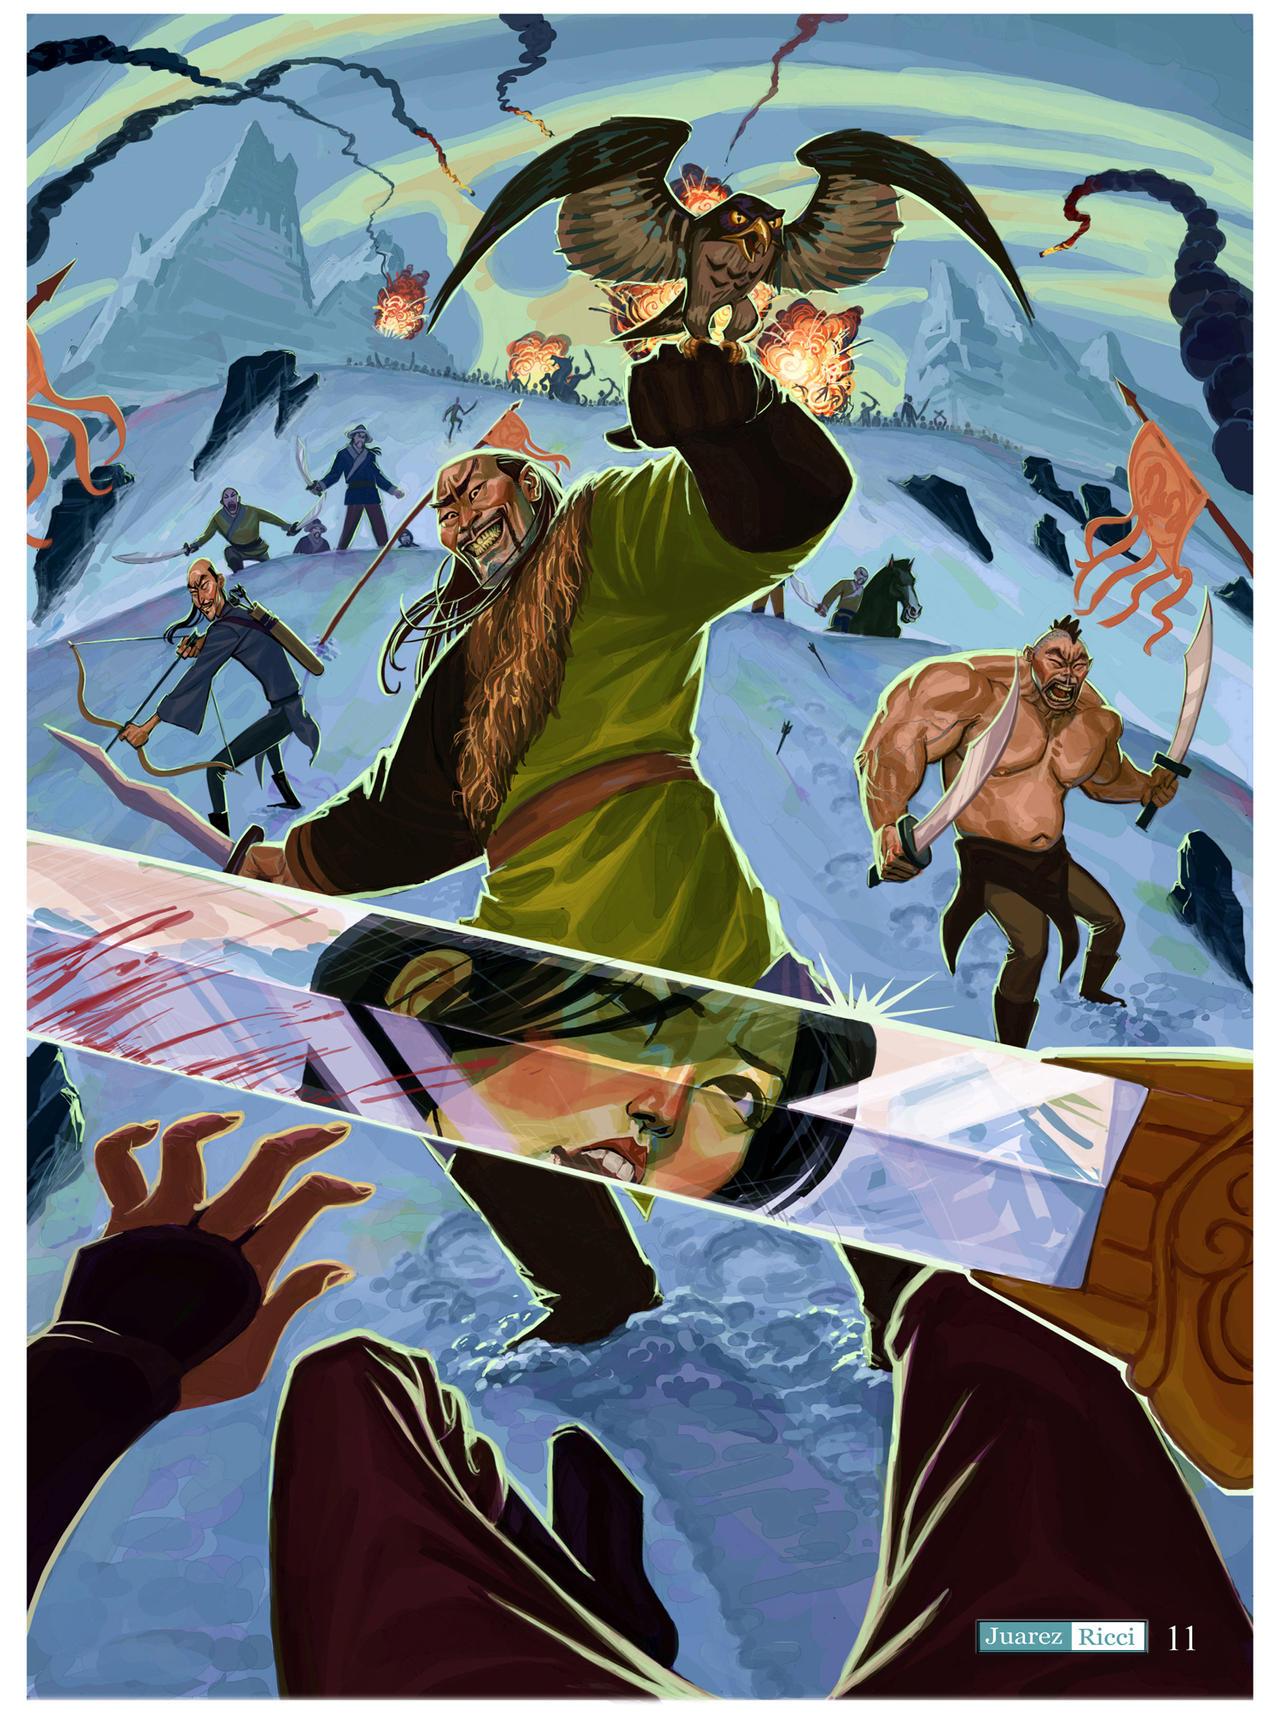 Mulan by juarezricci